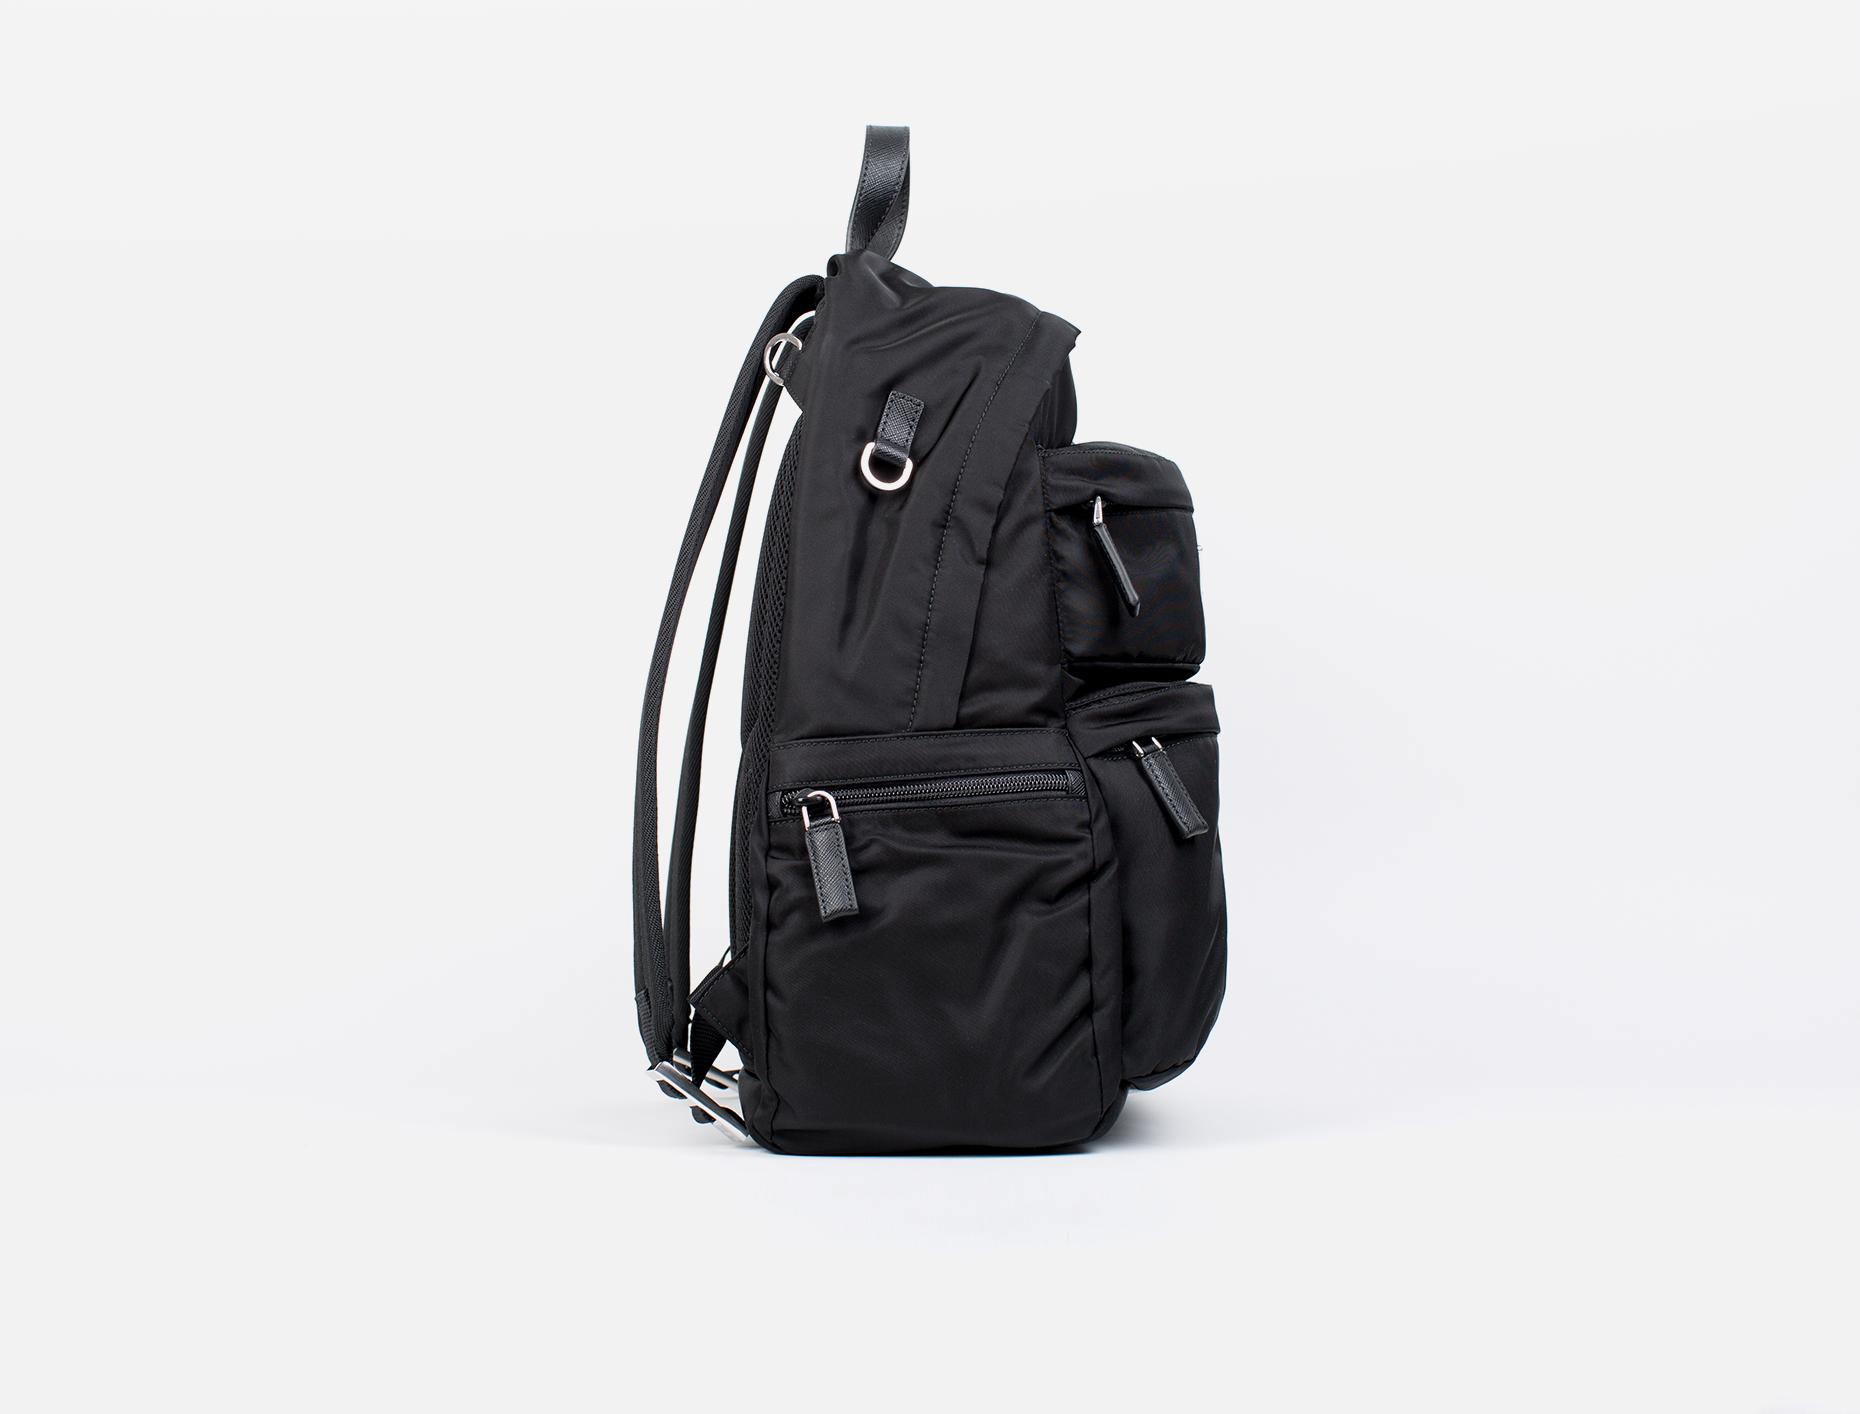 1dc43ef82f12 Prada Tessuto Montagna Nylon Backpack   Voo Store Berlin   Worldwide ...